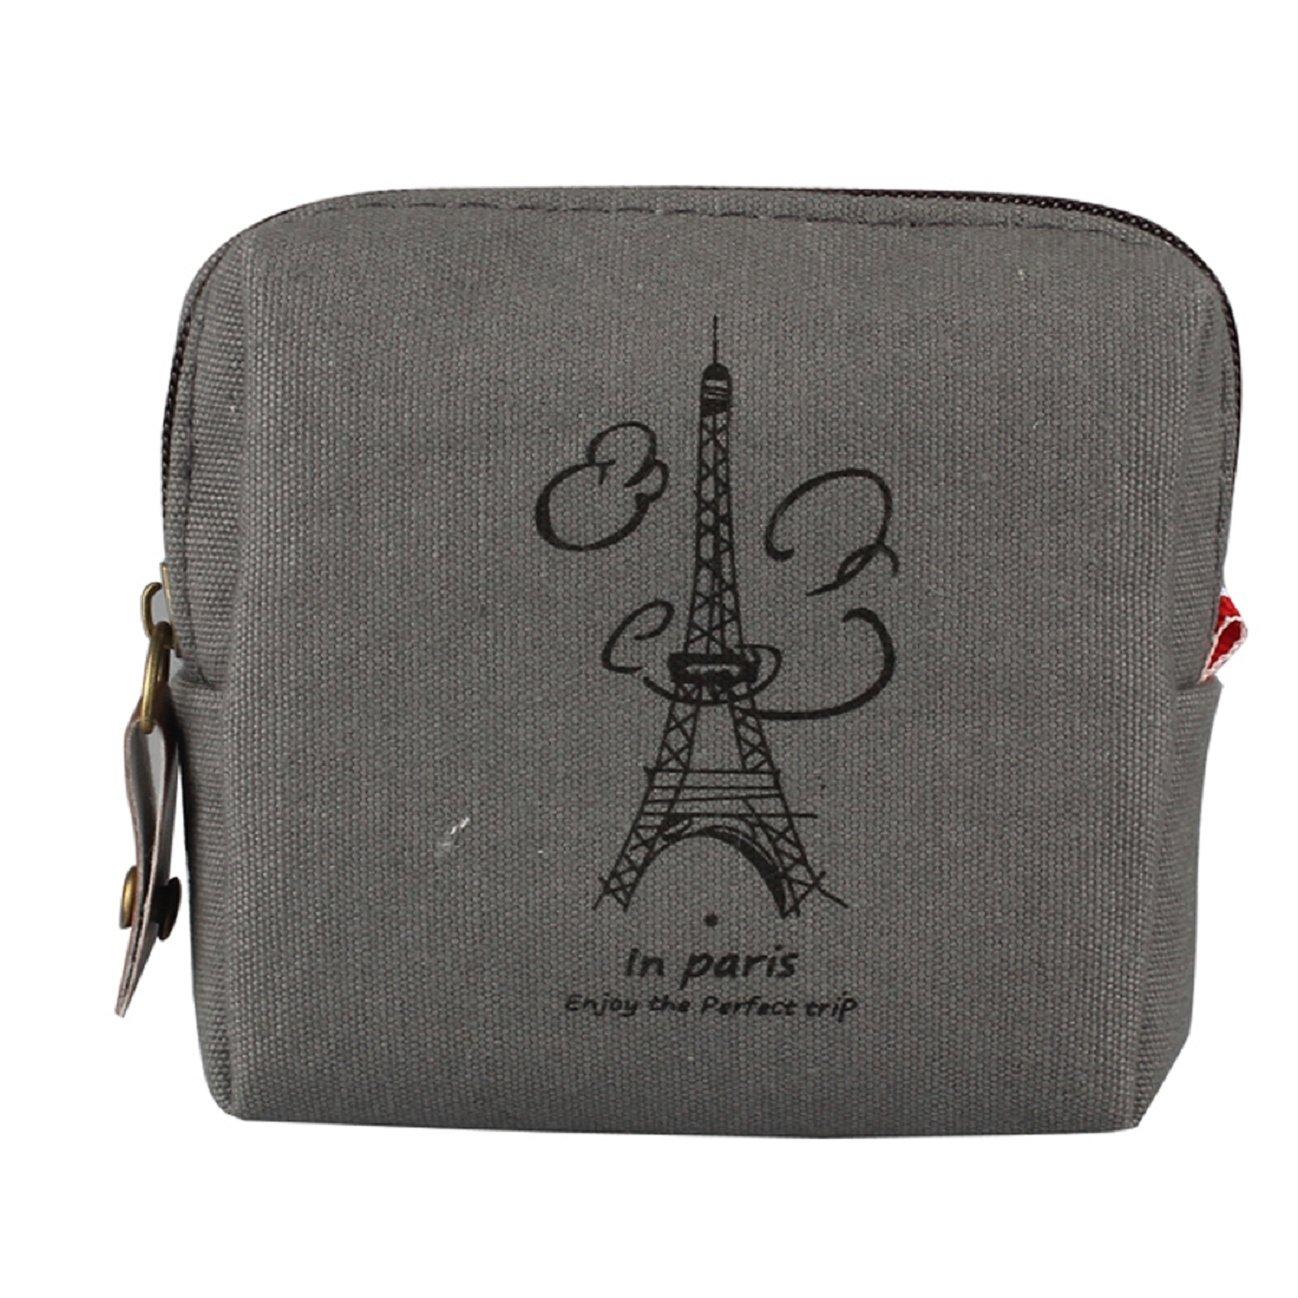 Tonsee(TM) Retro Lady Purse Wallet Card Holders Clutch Handbag (Gray)